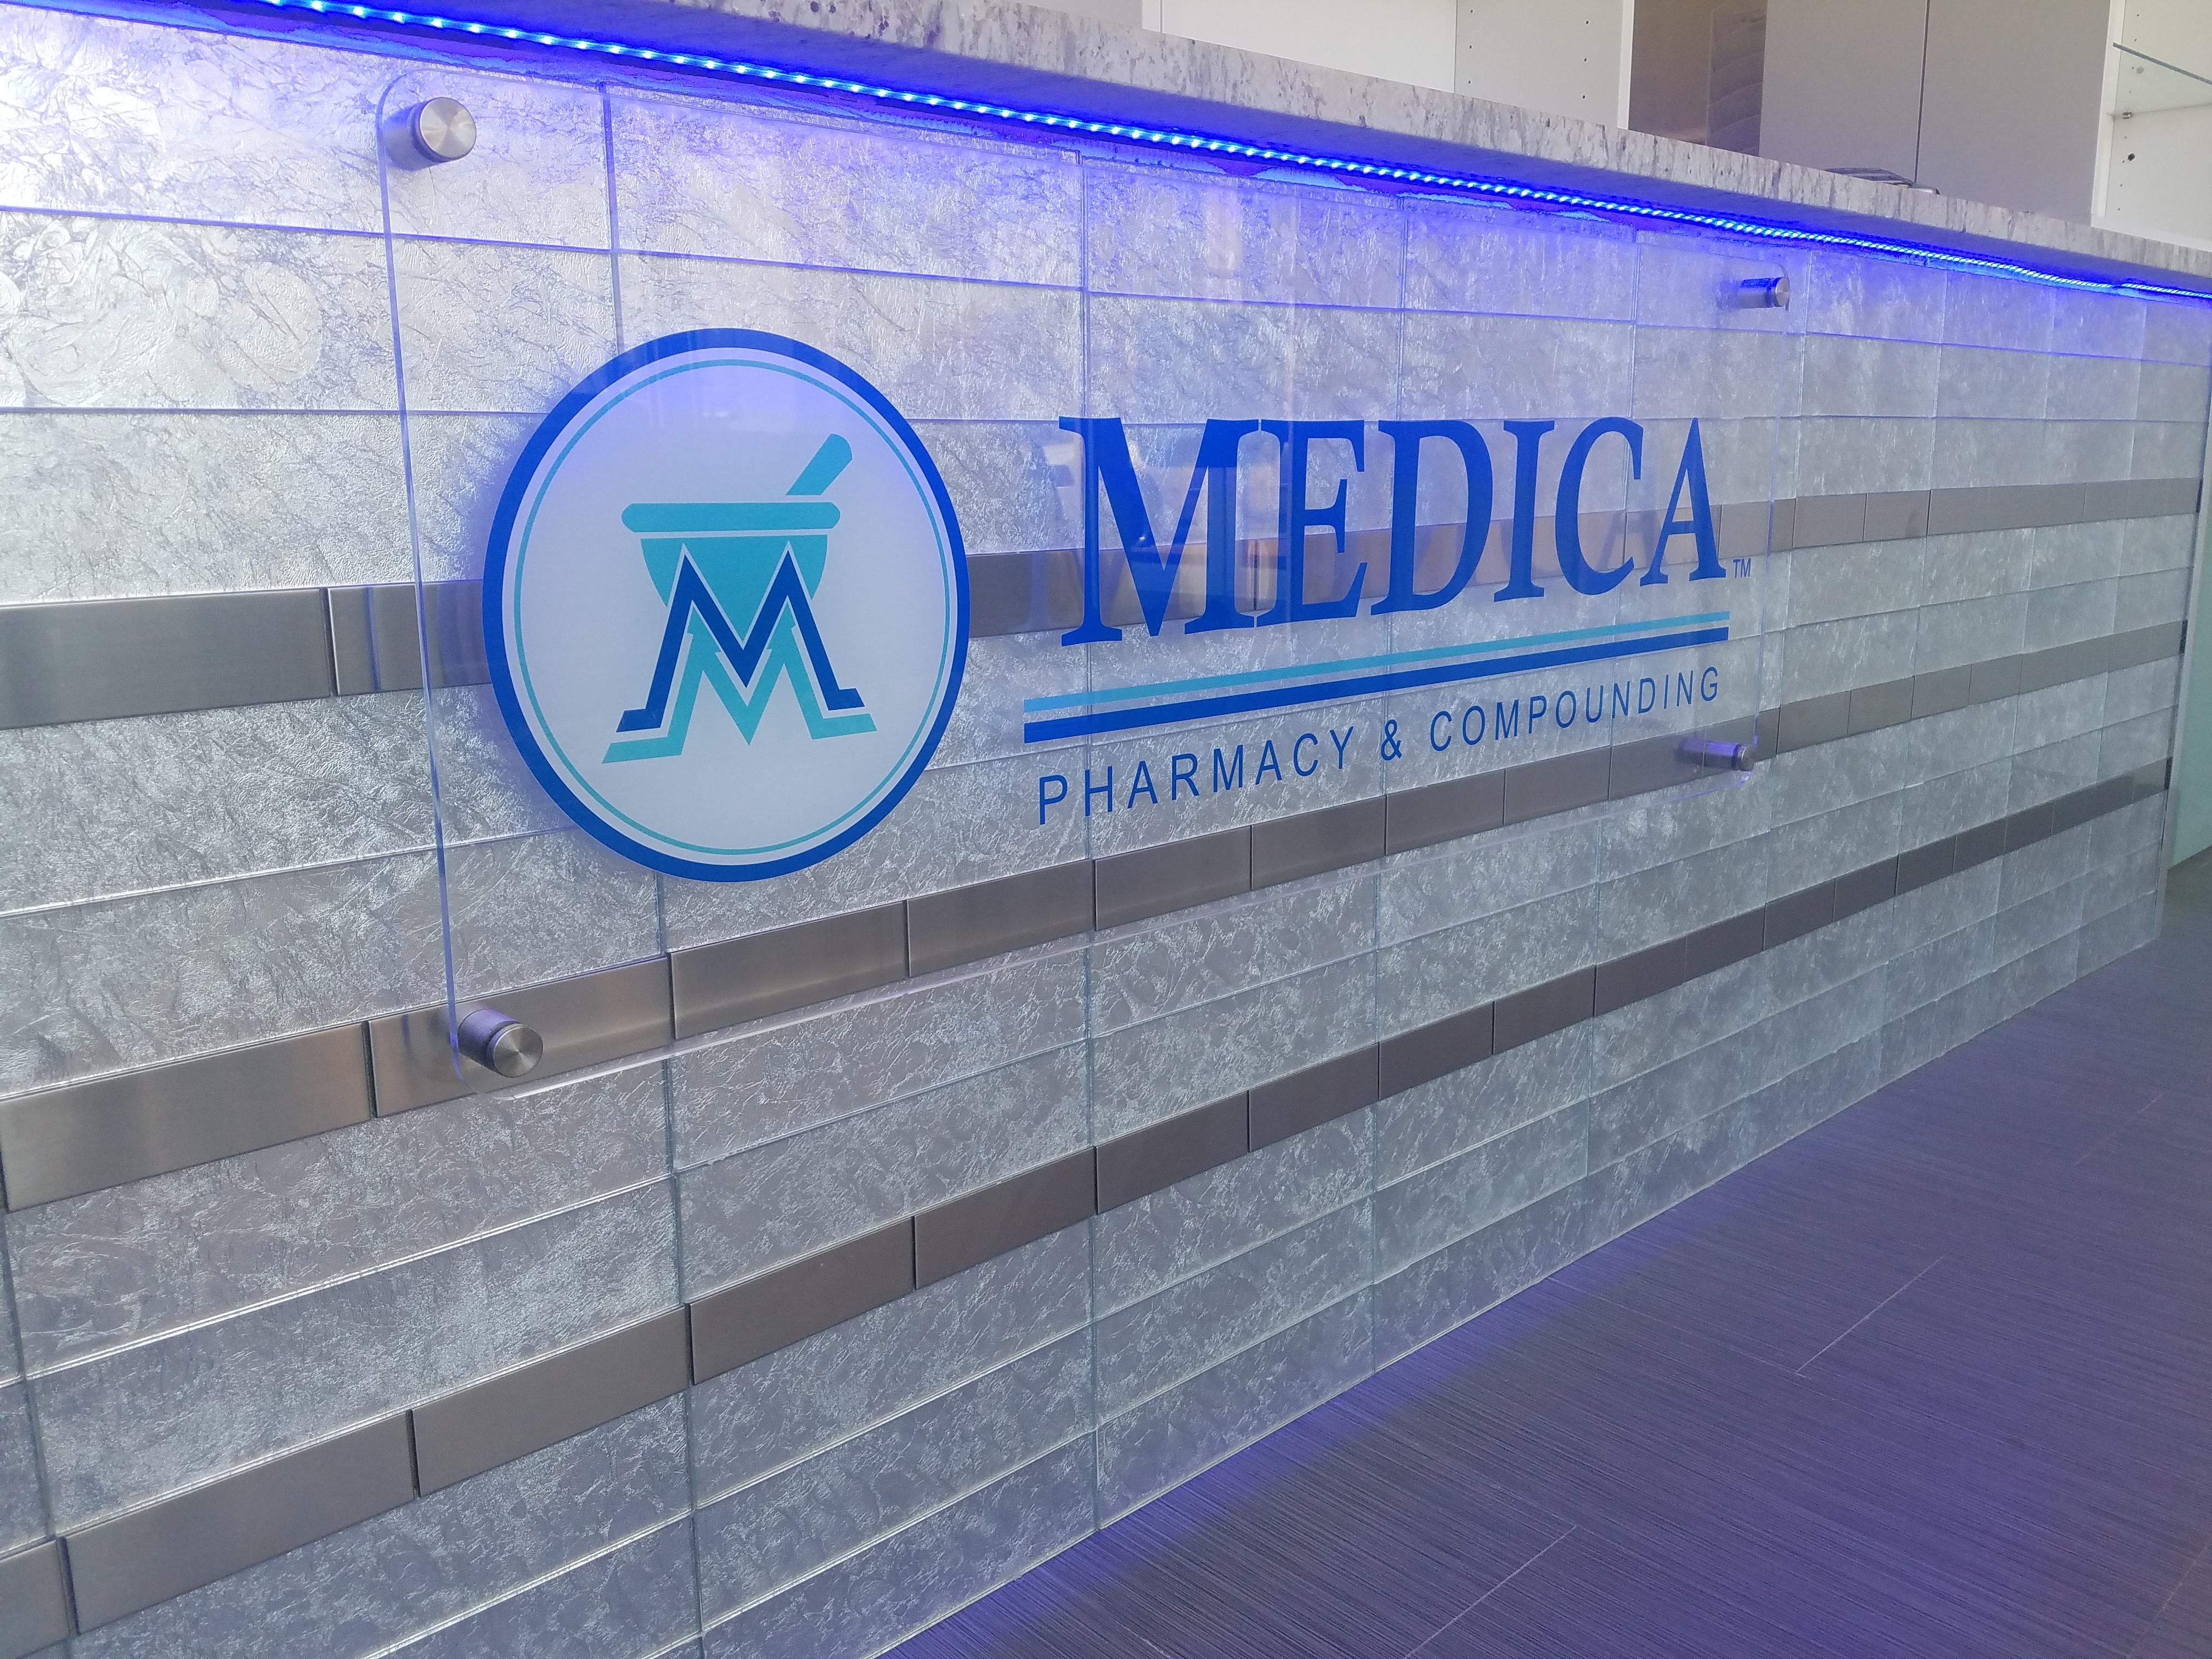 Medica Pharmacy & Compounding image 1